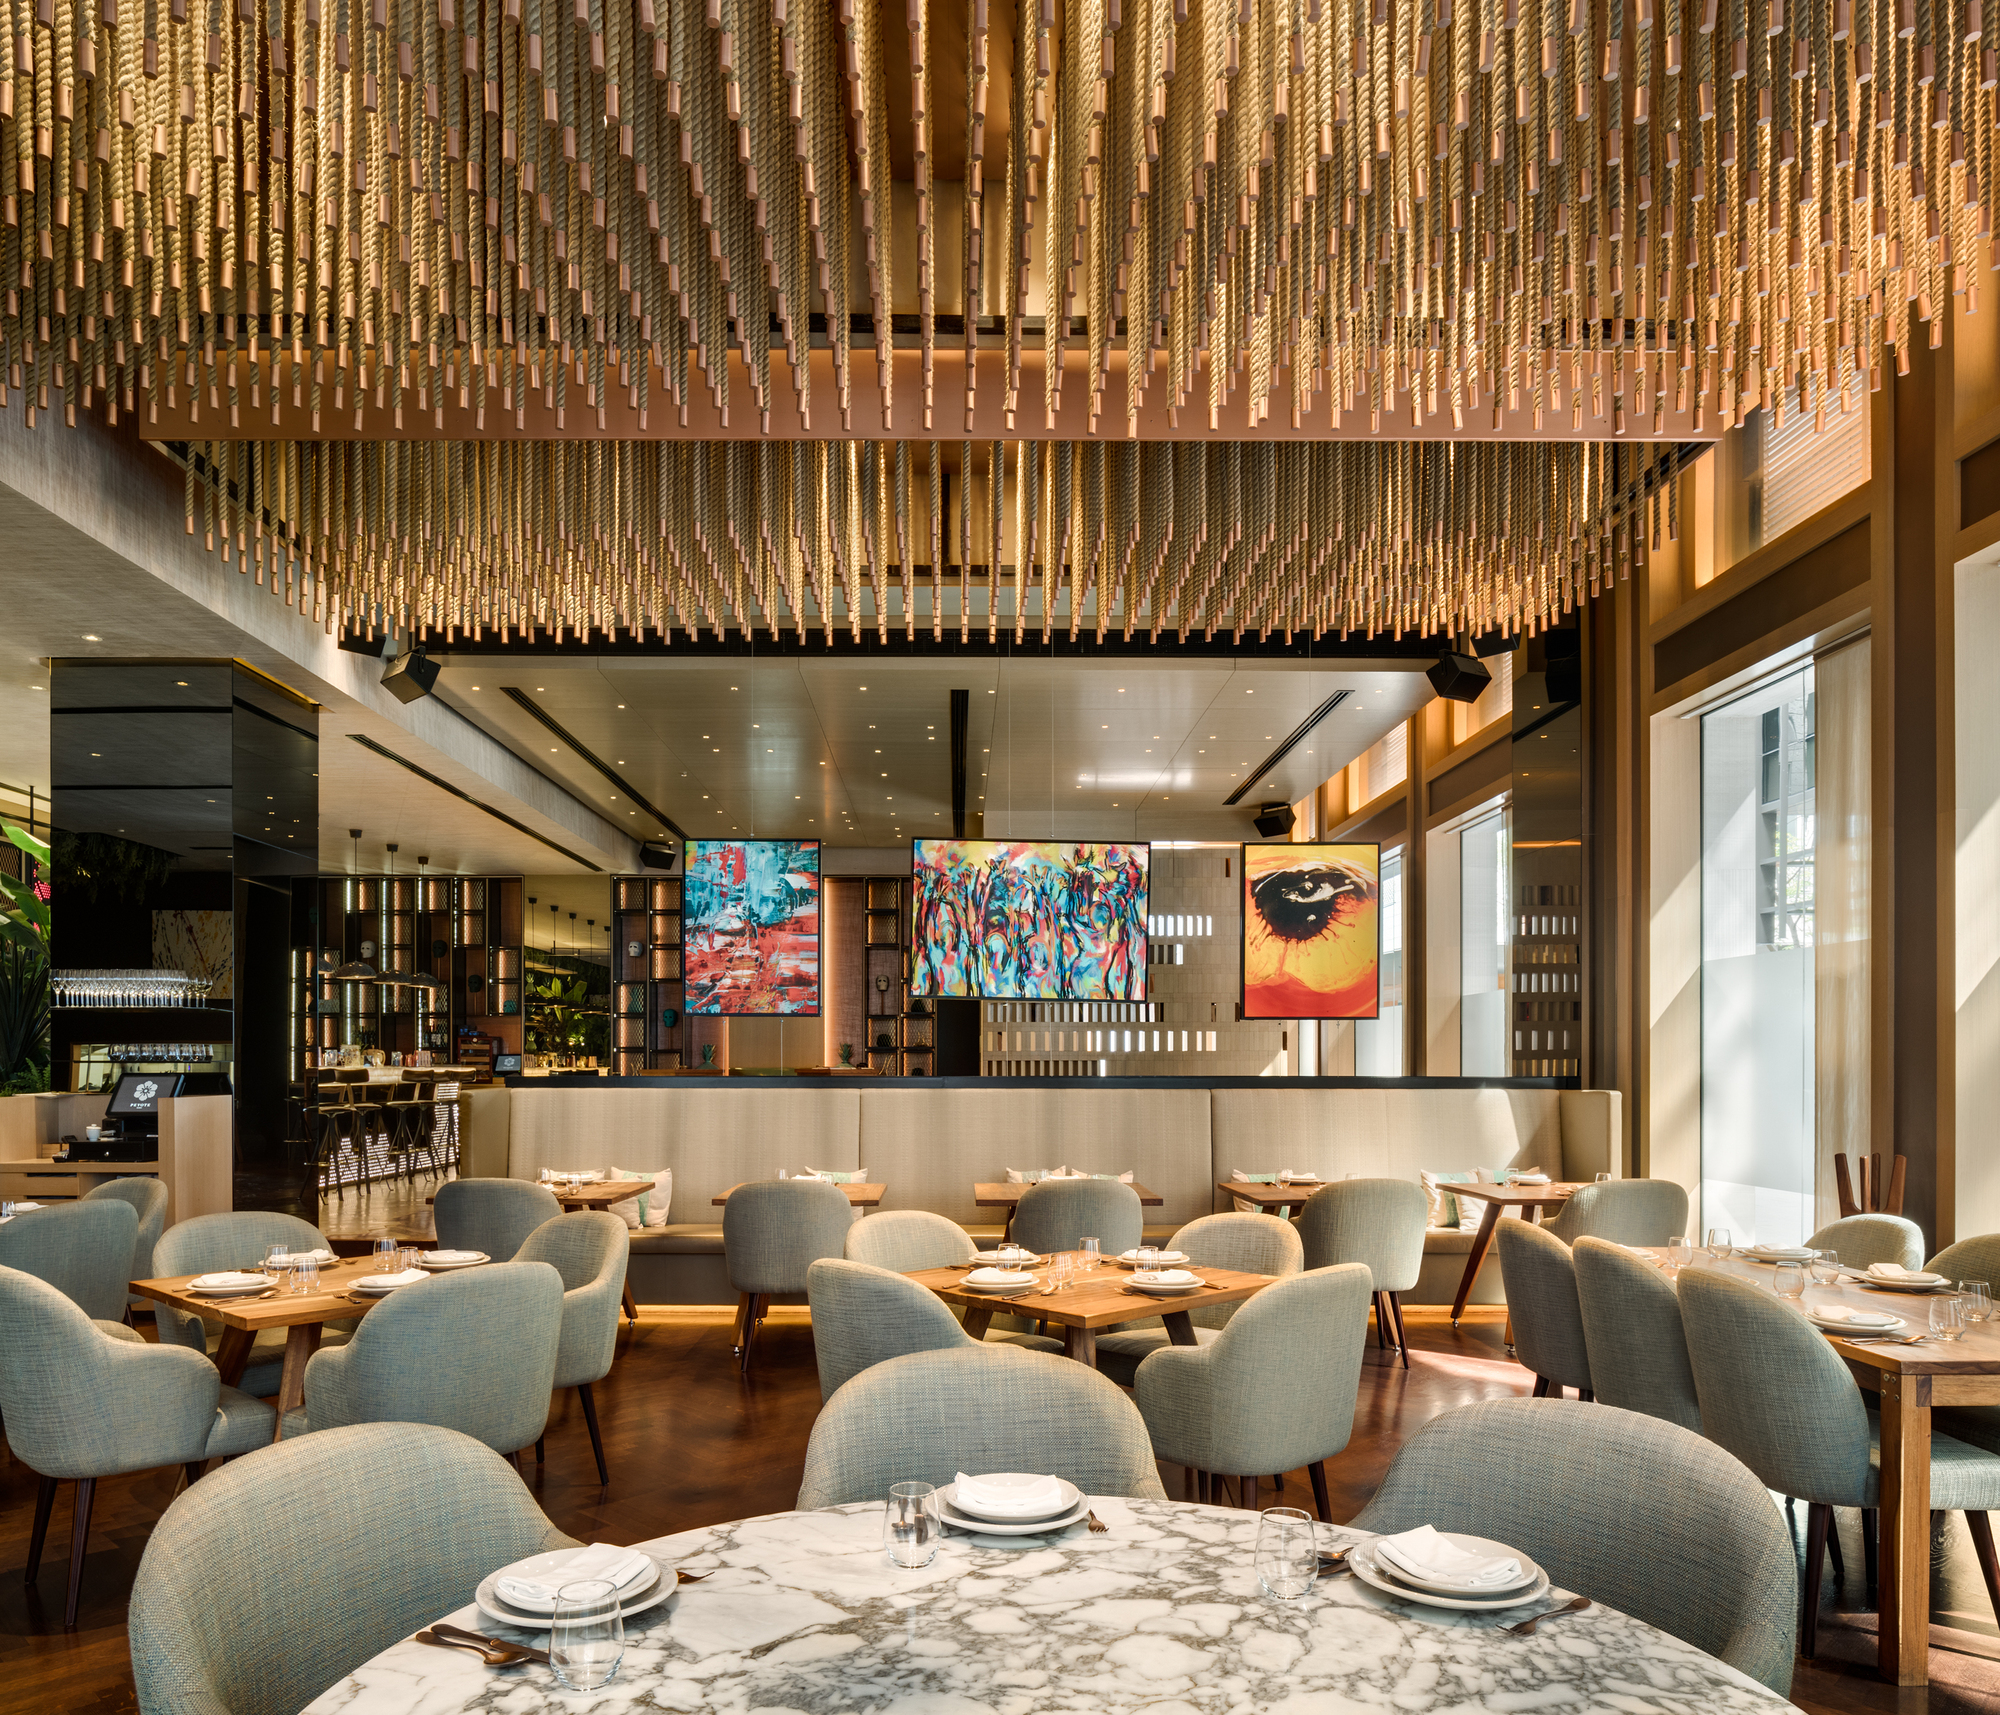 Peyote Dubai Restaurante / Sordo Madaleno Arquitectos | Plataforma  Arquitectura